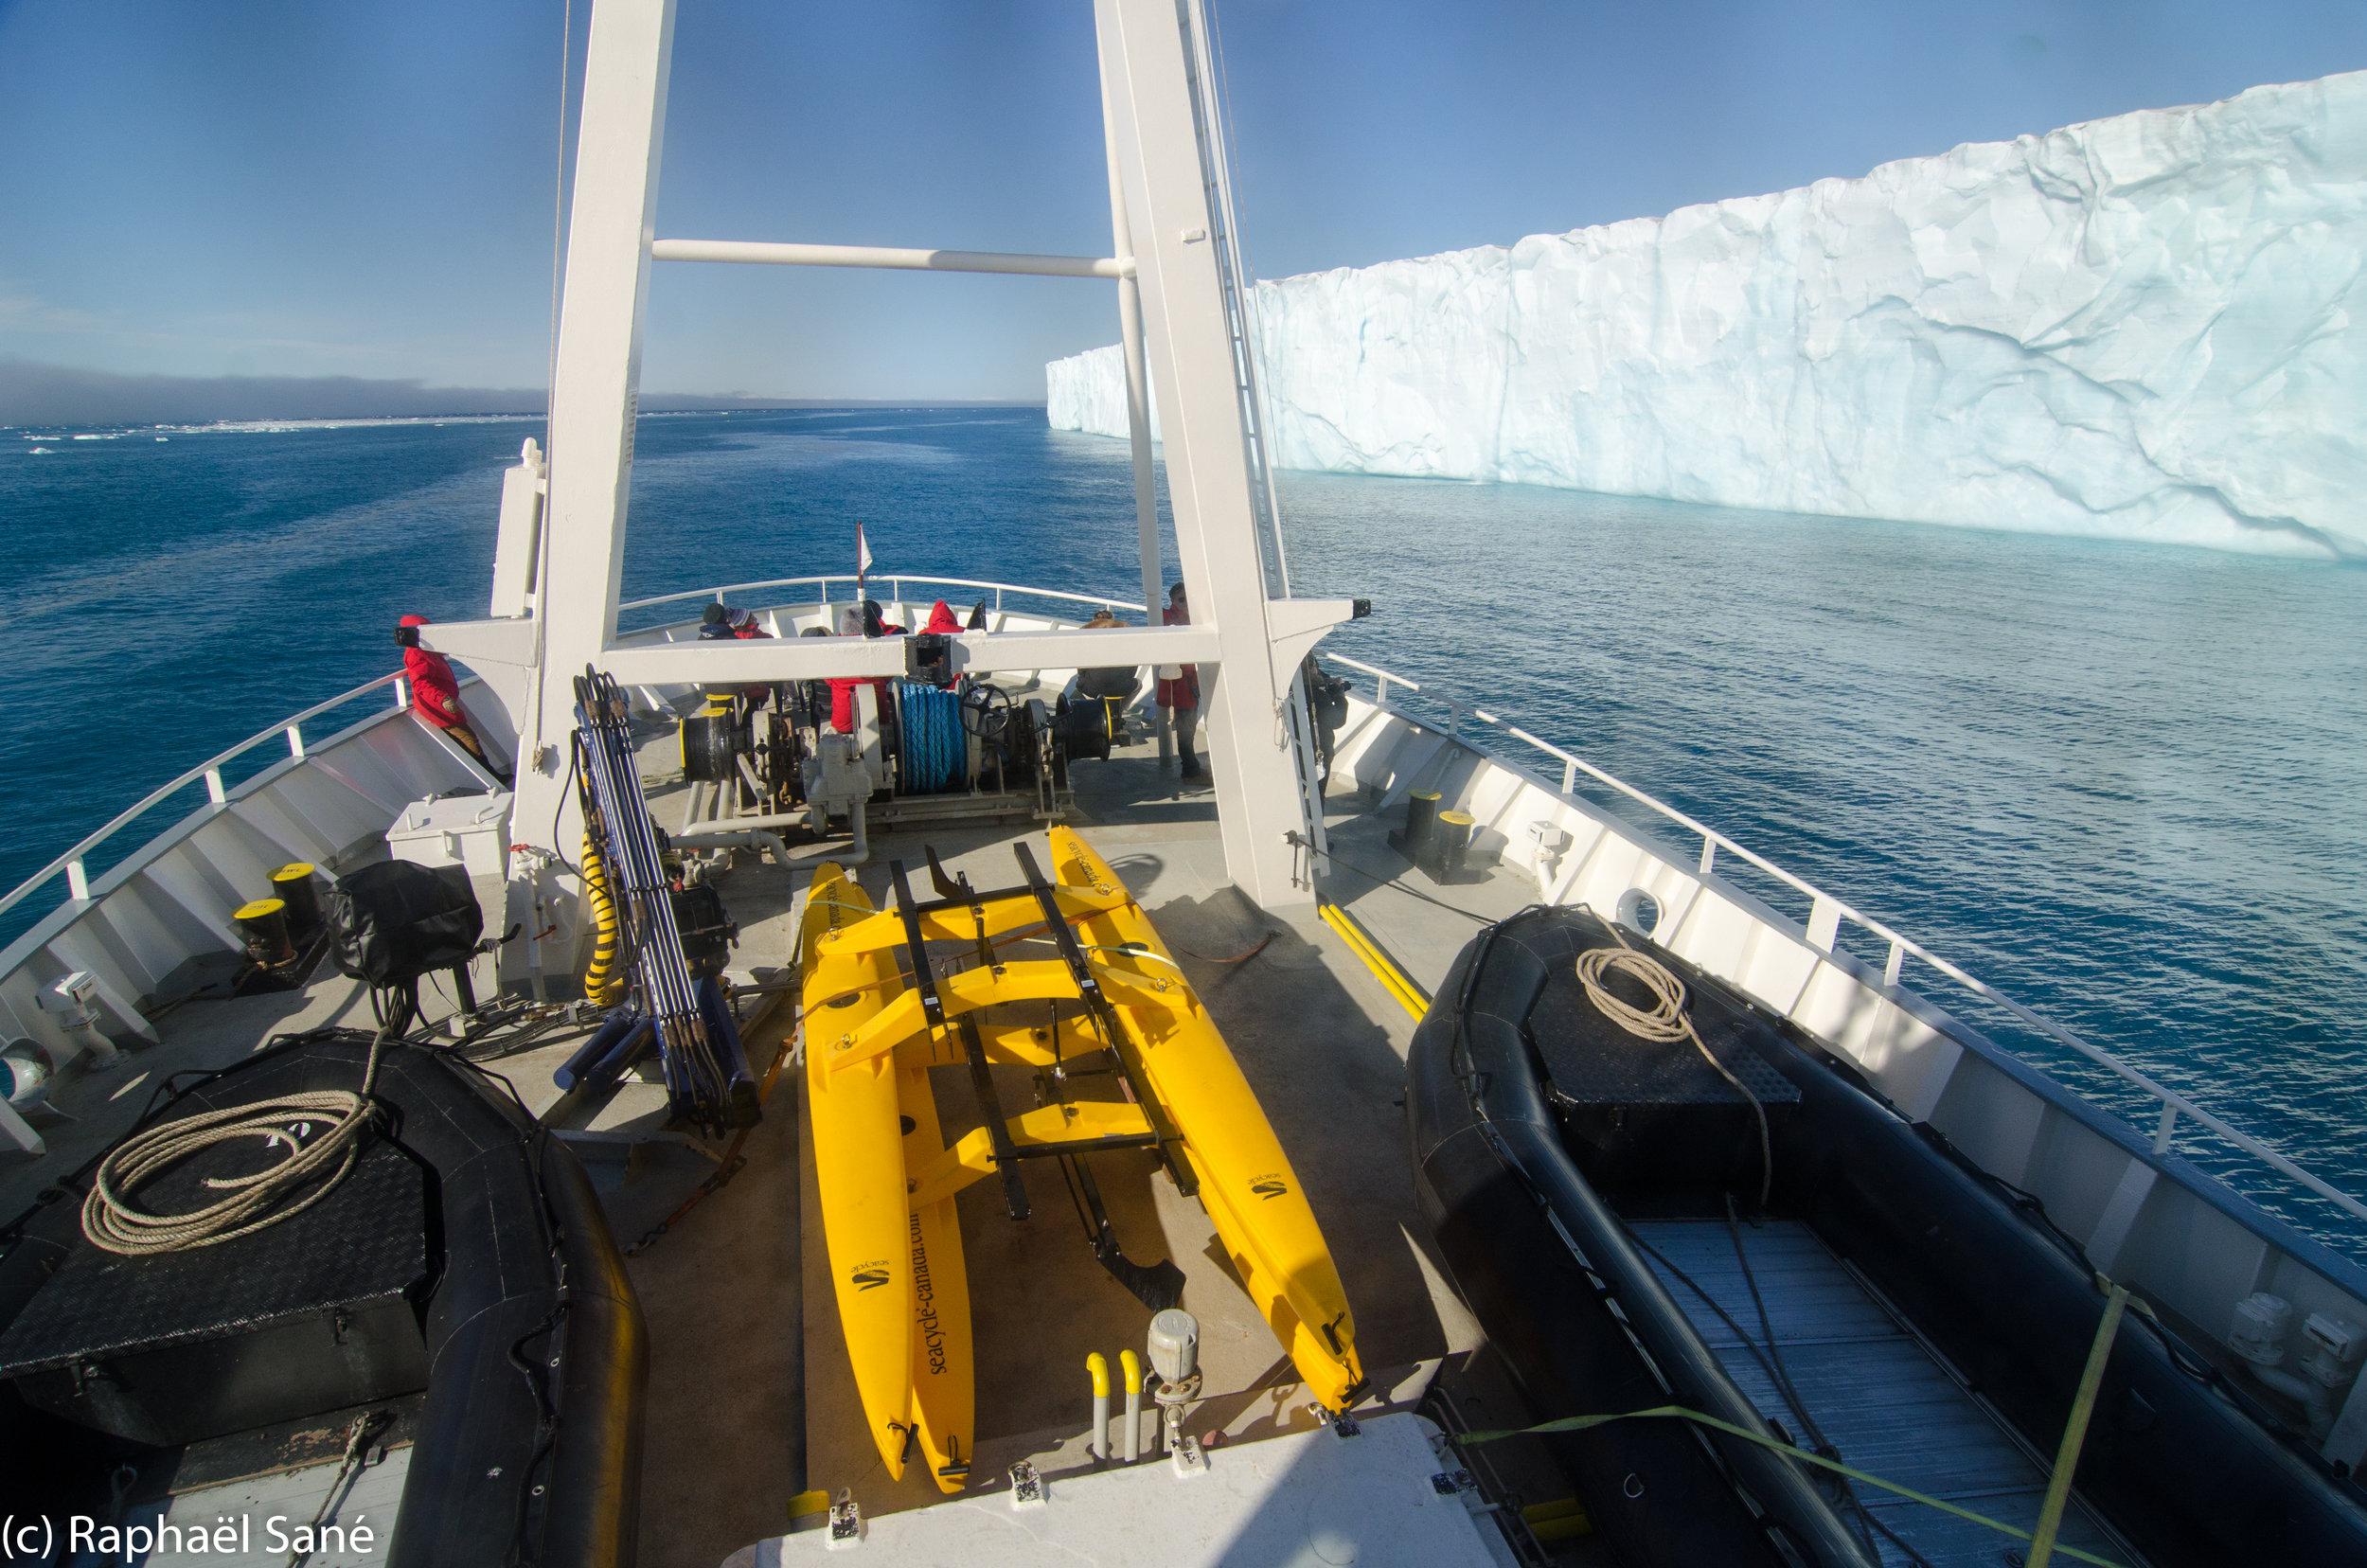 (c) SANE RAPHAEL-Polarfront-Latitude Blanche-6.jpg